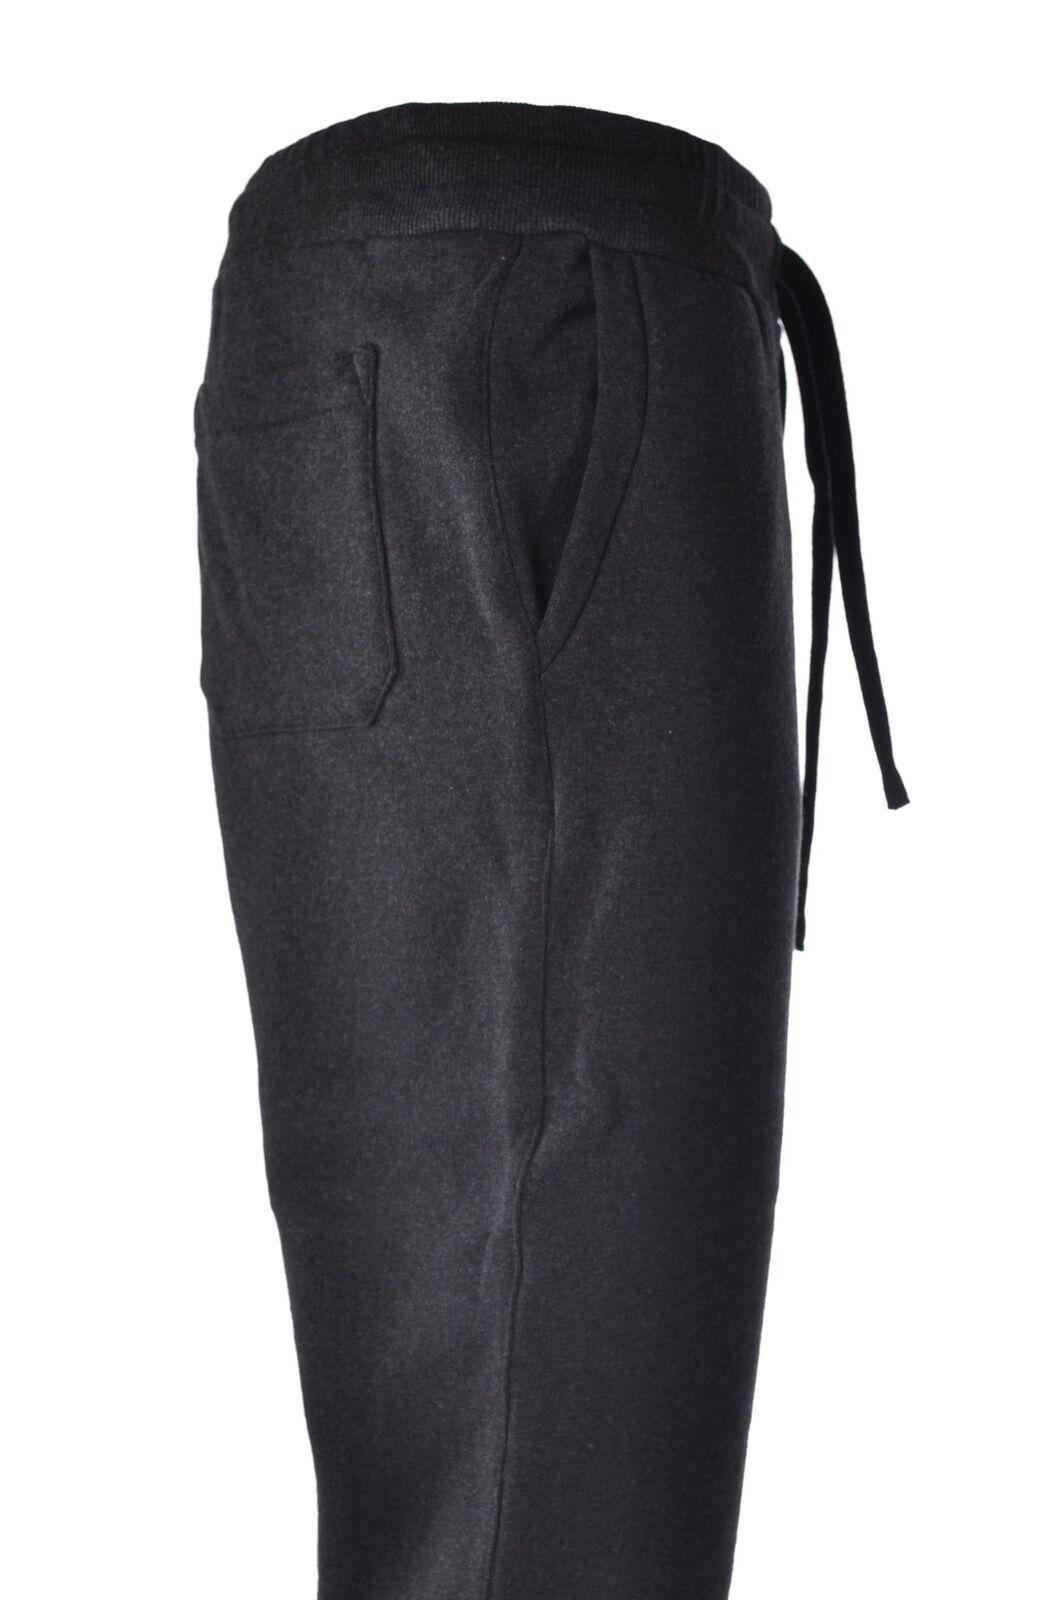 CROSSLEY - Pants-Shorts-sweatshirt - Man - Grey - 4106223C183849